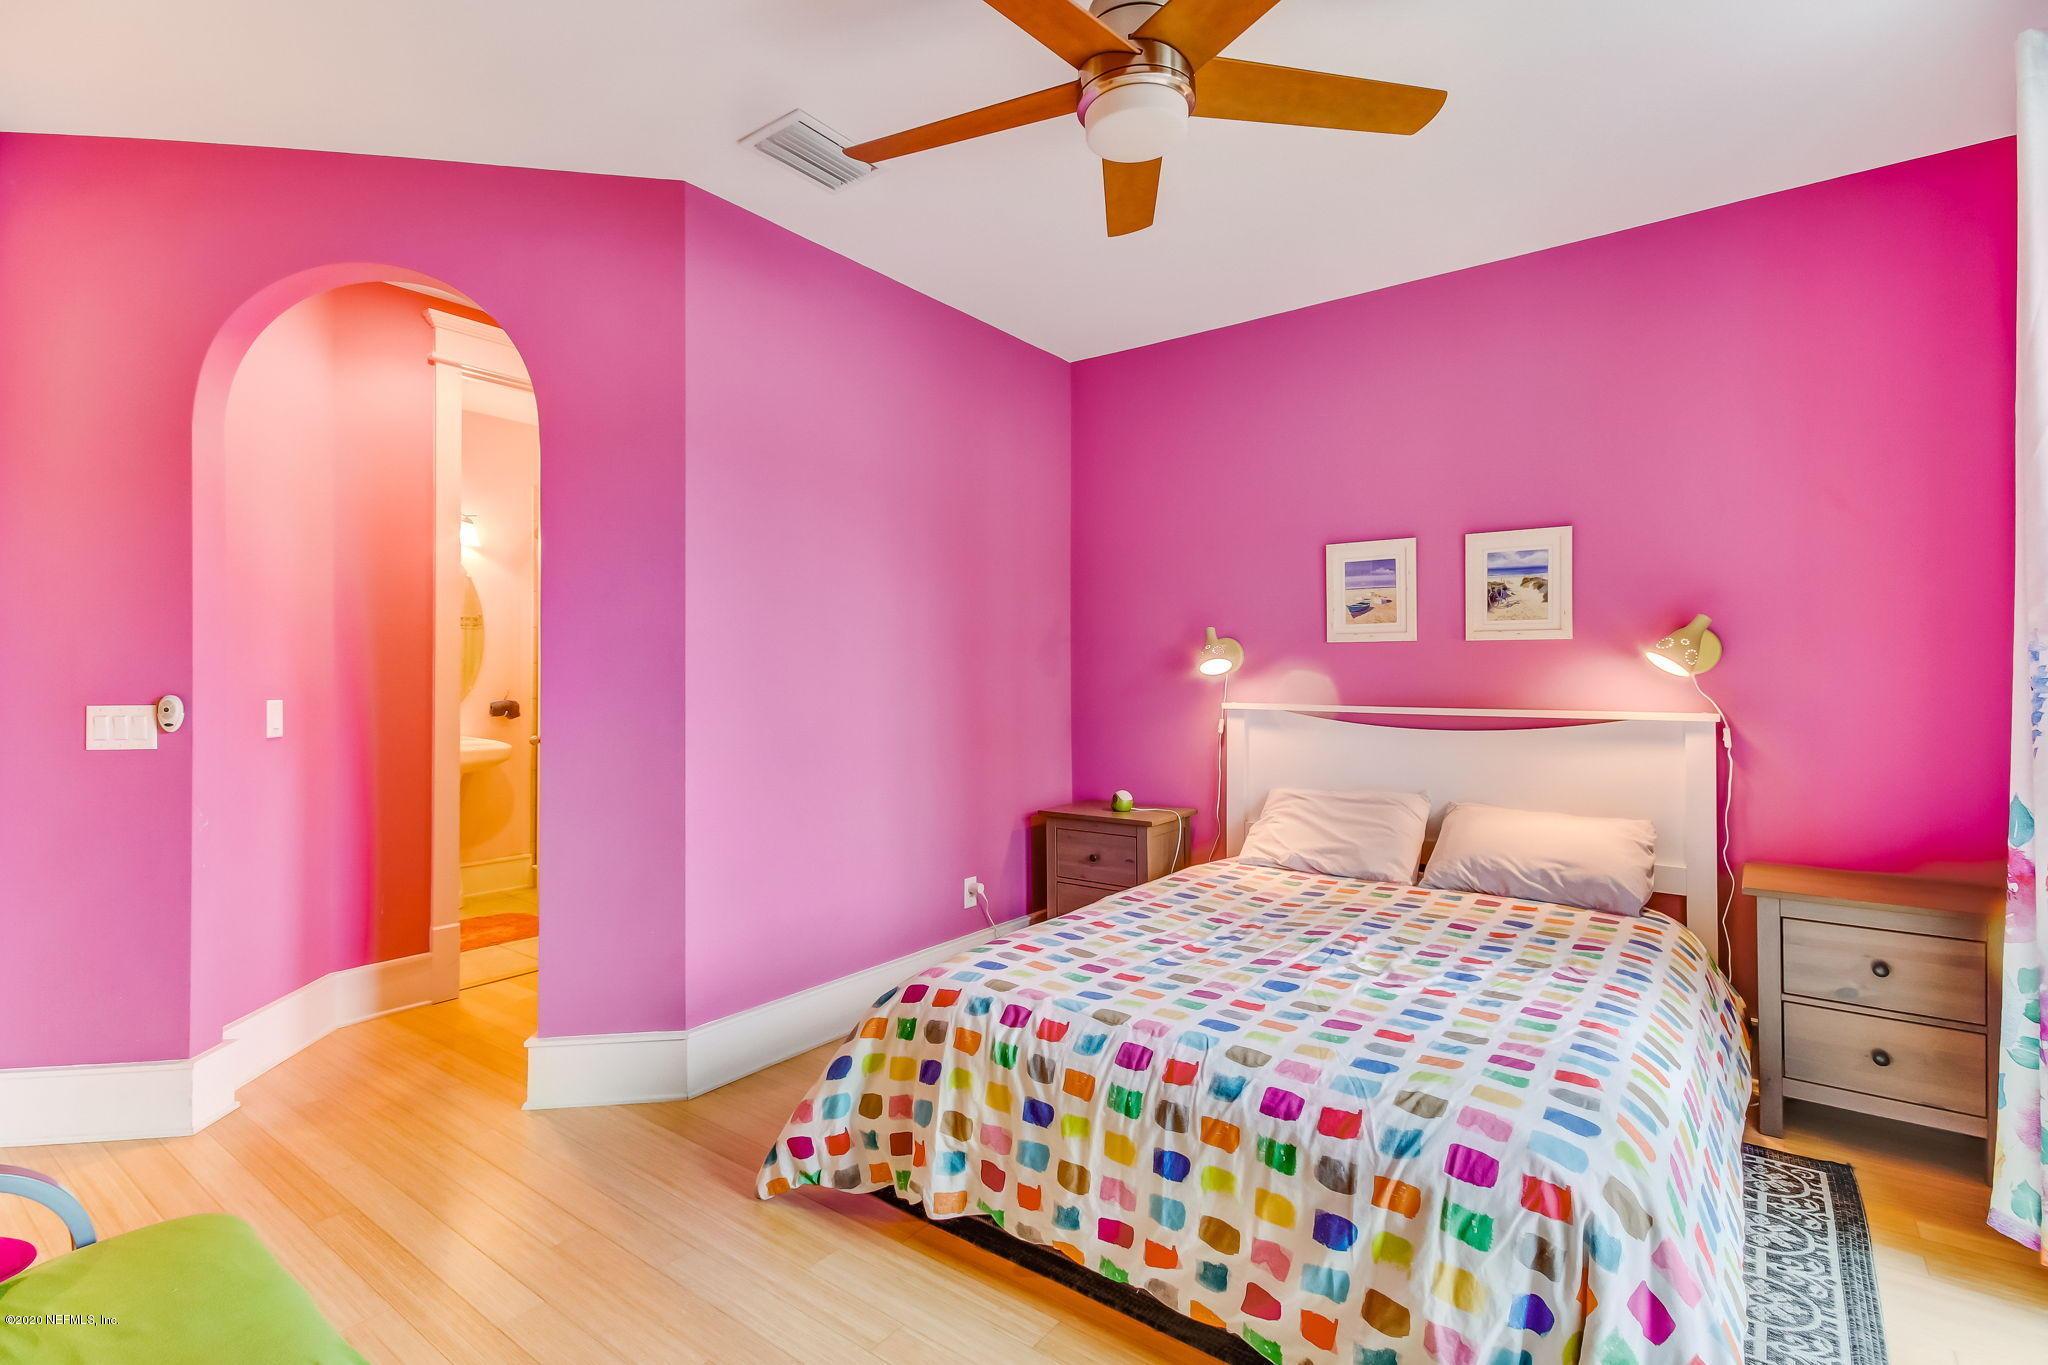 3207 EVENTIDE, FERNANDINA BEACH, FLORIDA 32034, 5 Bedrooms Bedrooms, ,4 BathroomsBathrooms,Residential,For sale,EVENTIDE,1082892